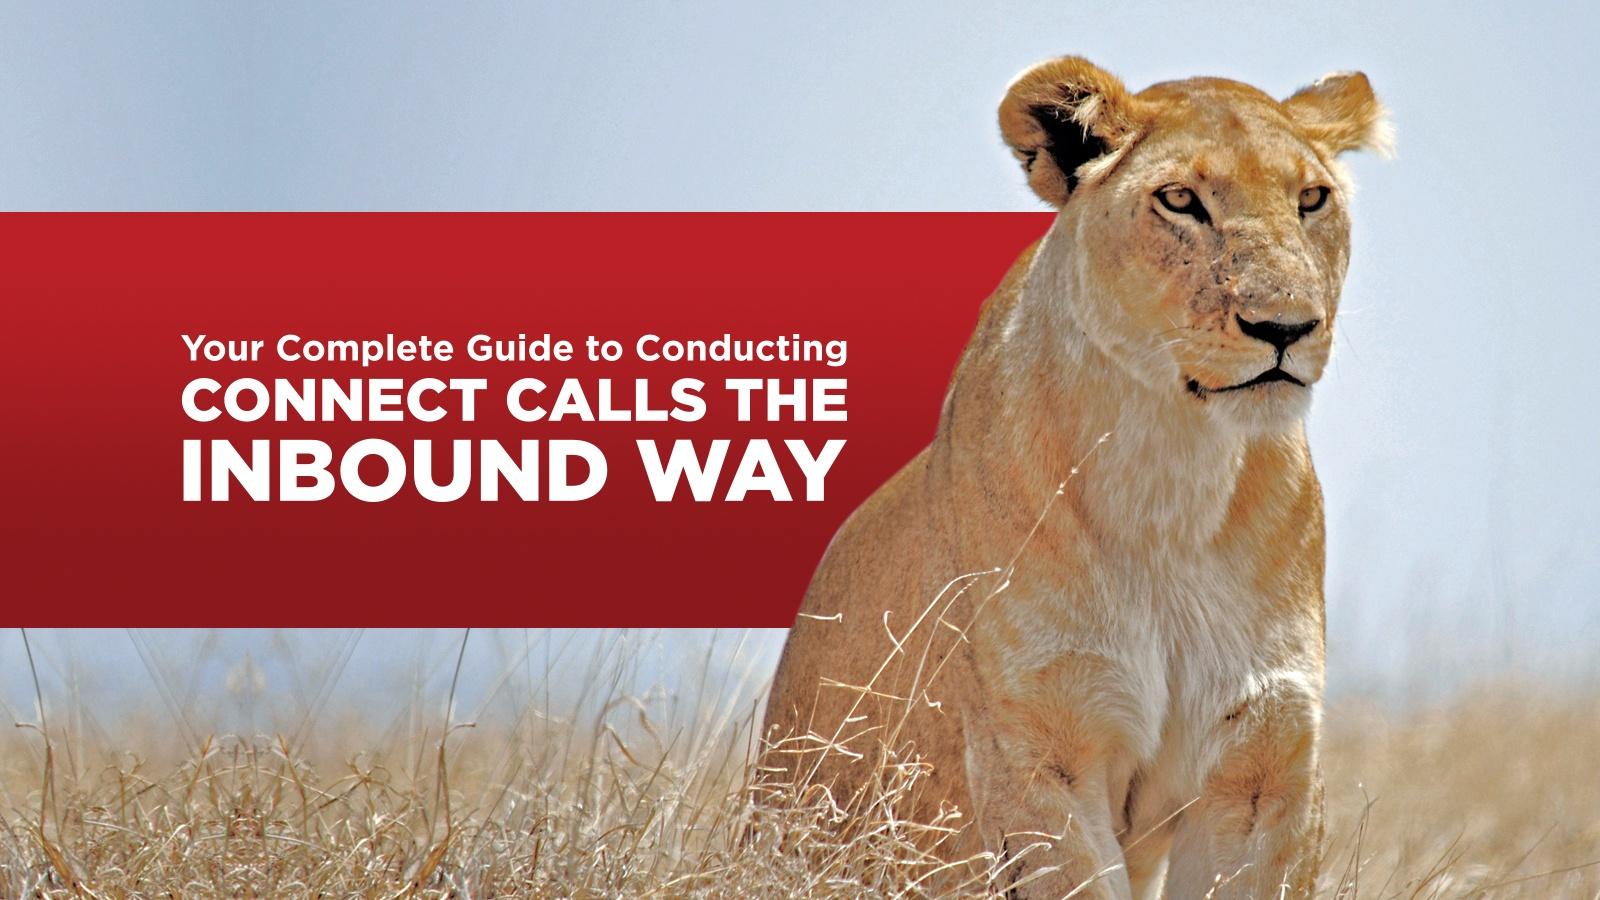 XK3-Blog-Conducting-Calls-the-Inbound-Way-option-1